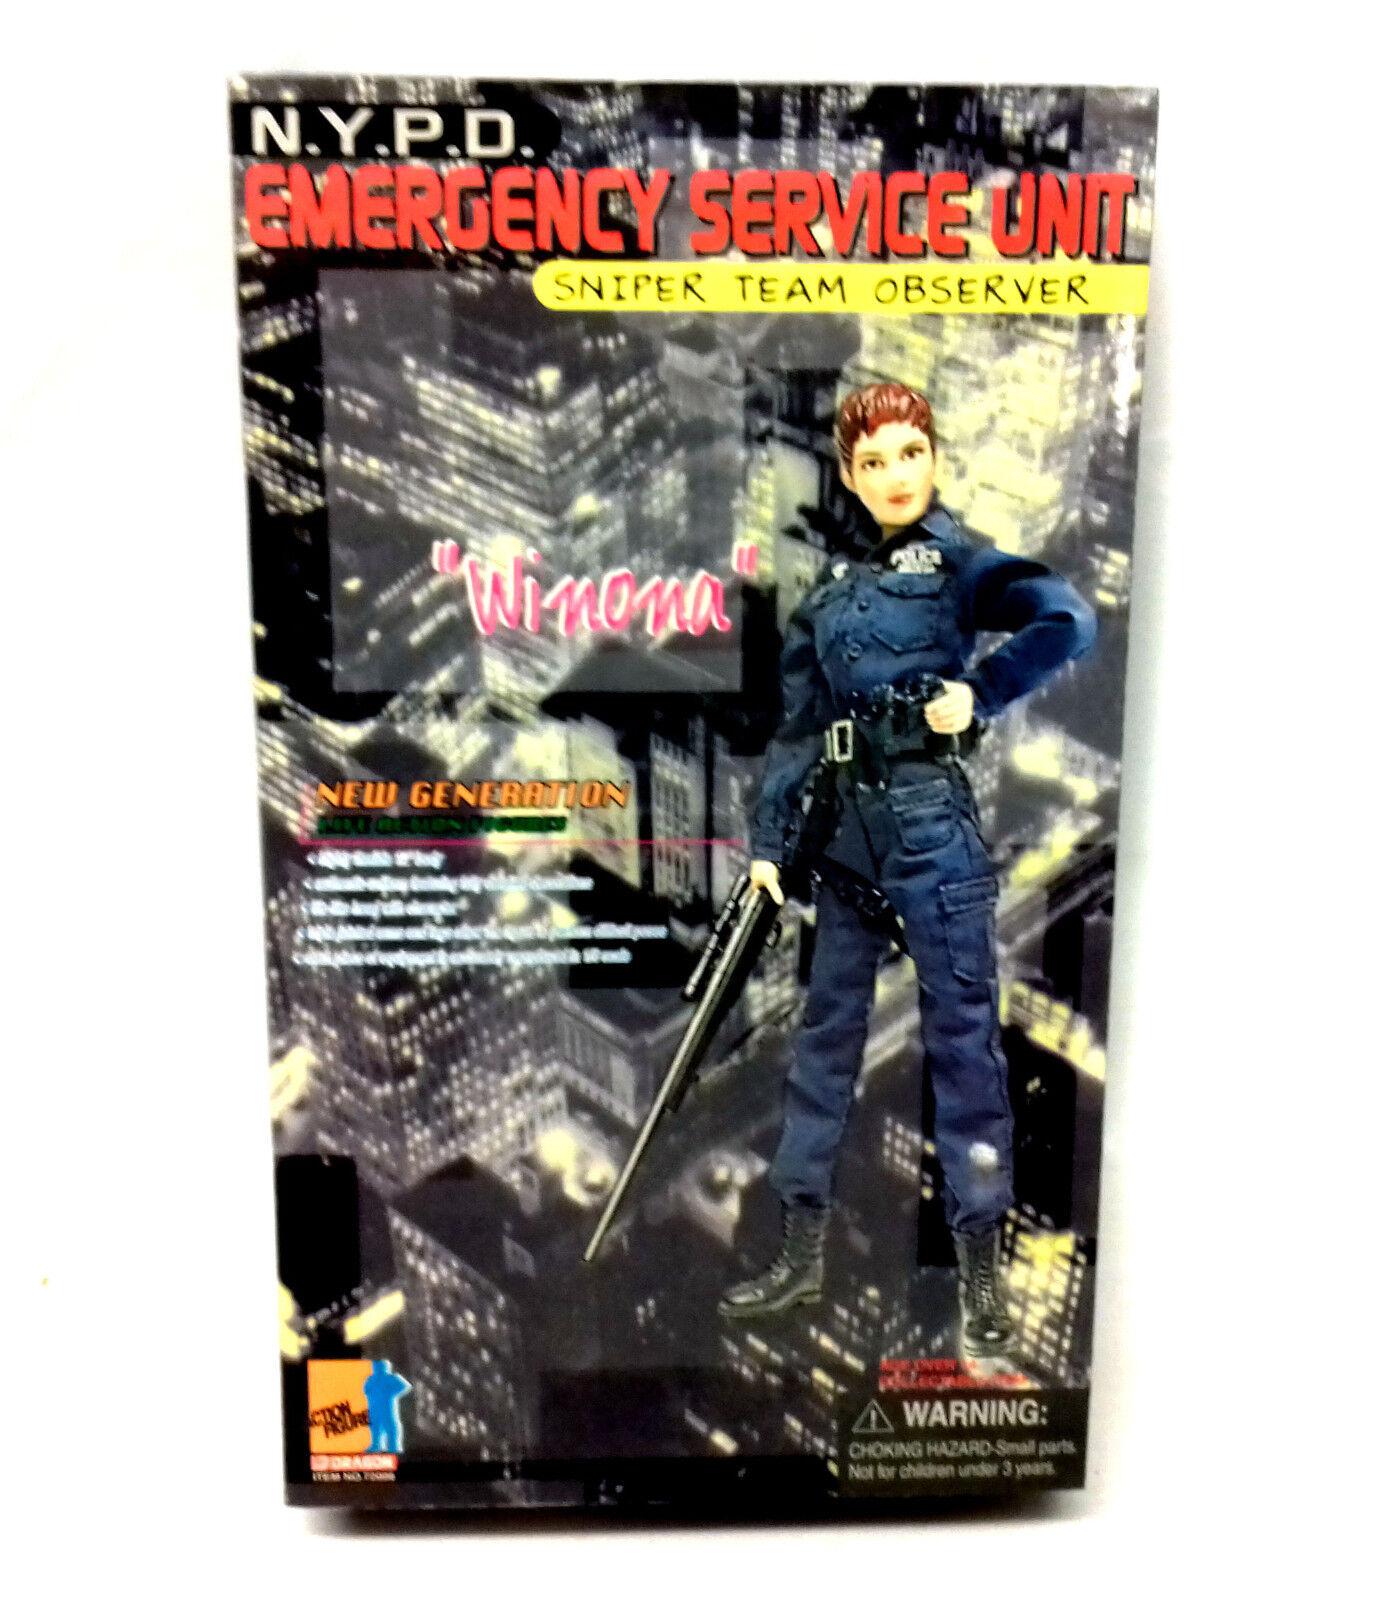 Dragun NYPD SNIPER TEAM OBSERVER Winoa 12  1 6th US Police collector figure toy